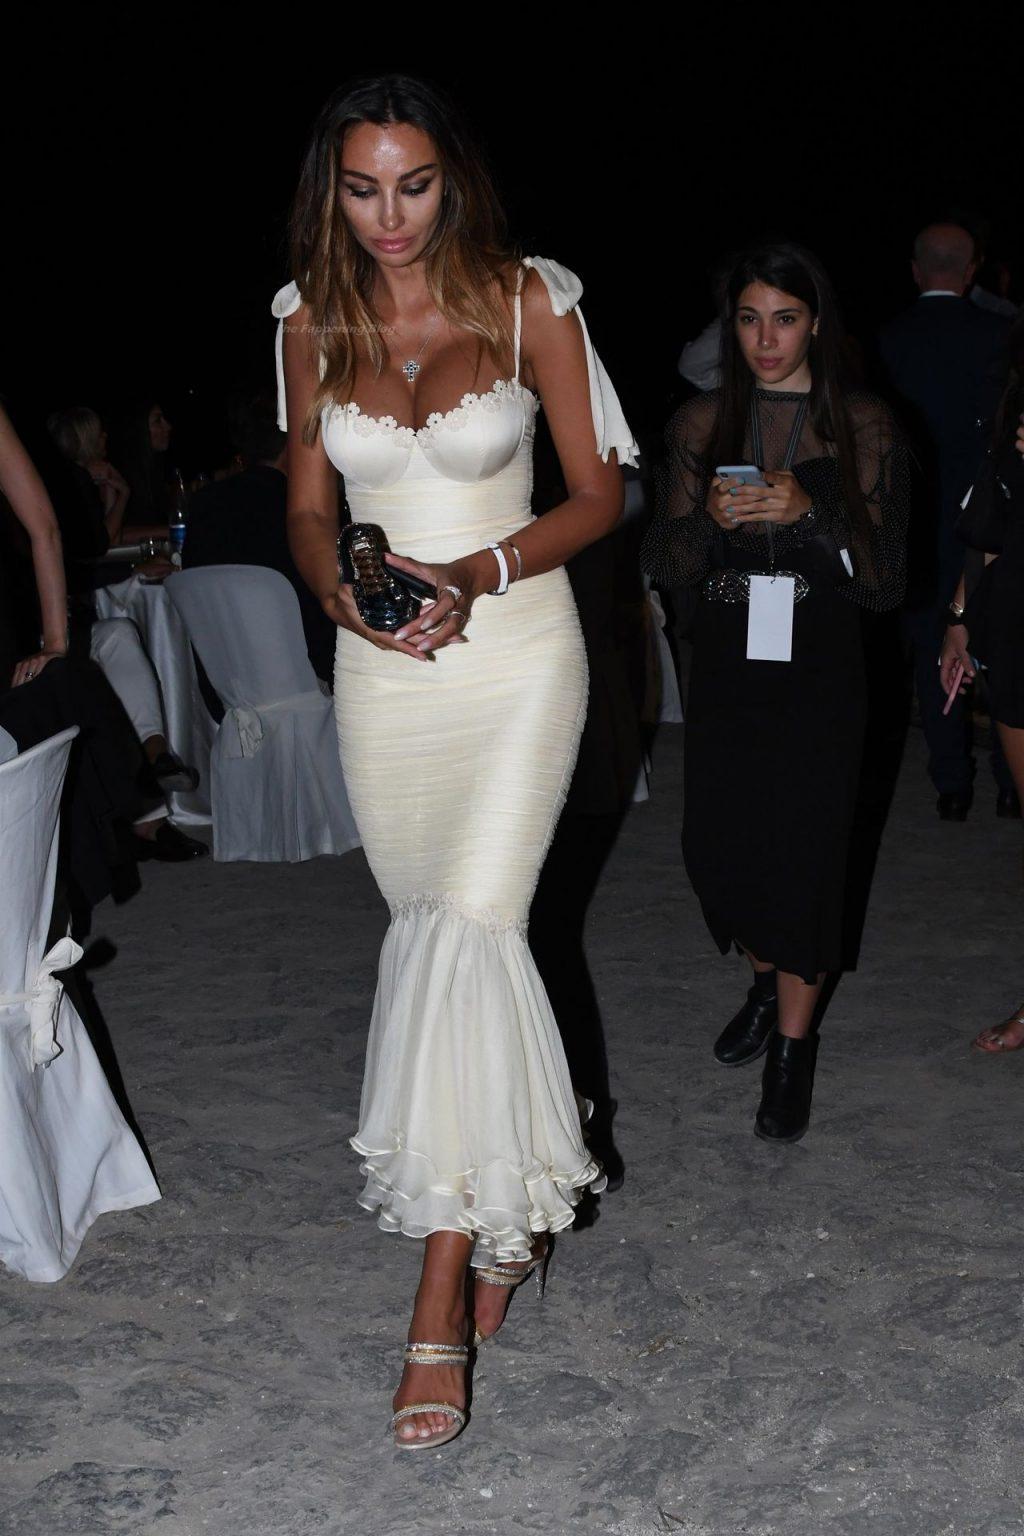 Madalina Ghenea Flaunts Nice Cleavage at The Ischia Global Festival (Photos + Video)